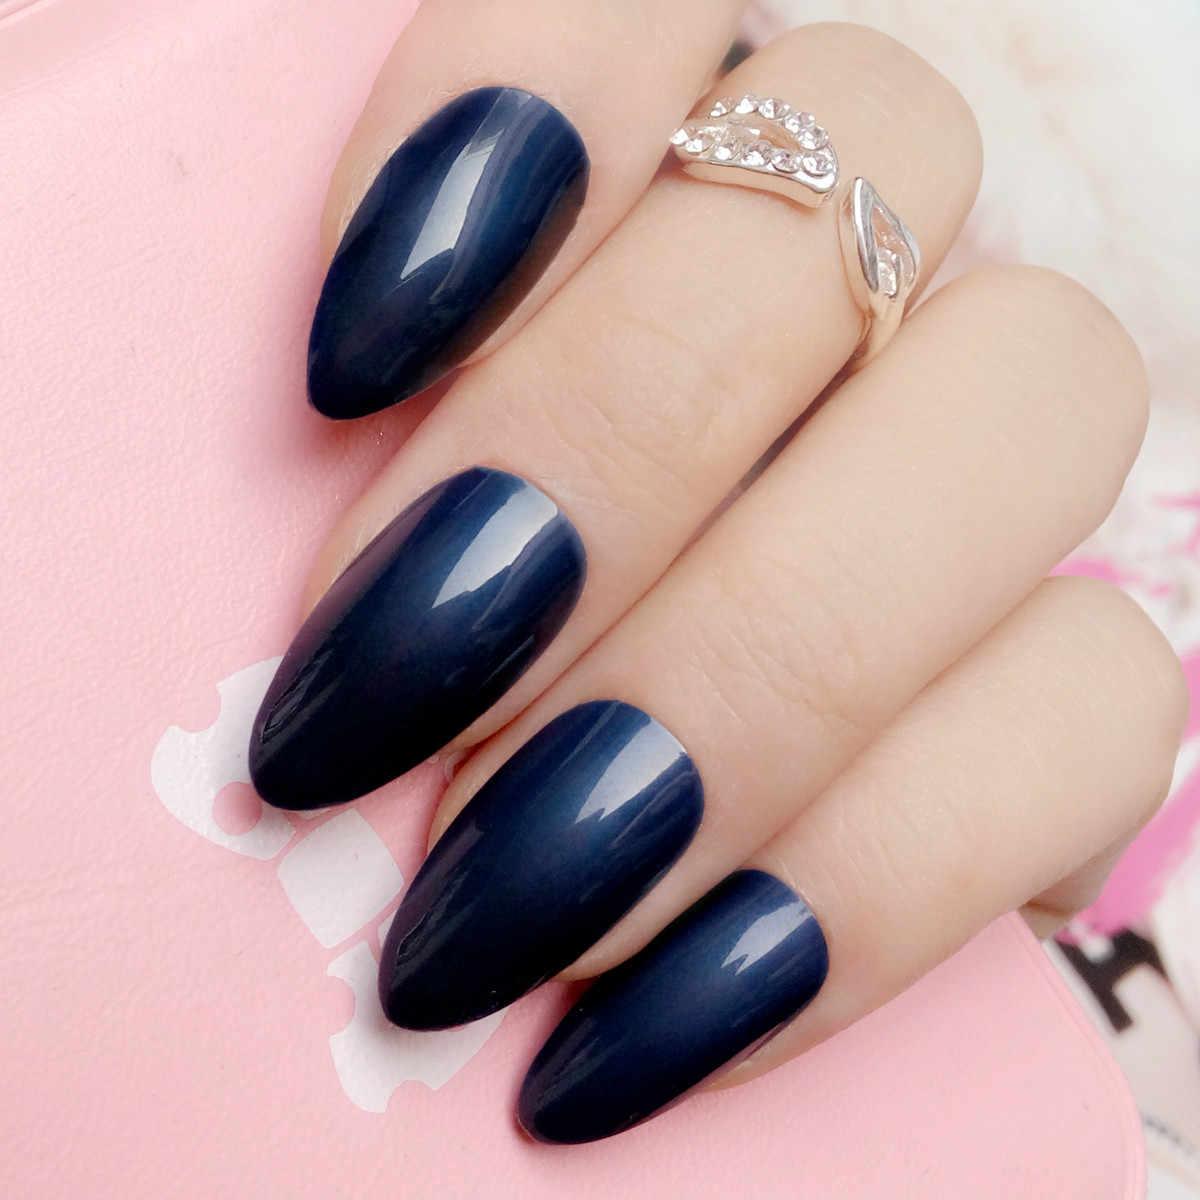 Uñas Postizas De Color Caramelo De Color Azul Marino De Moda